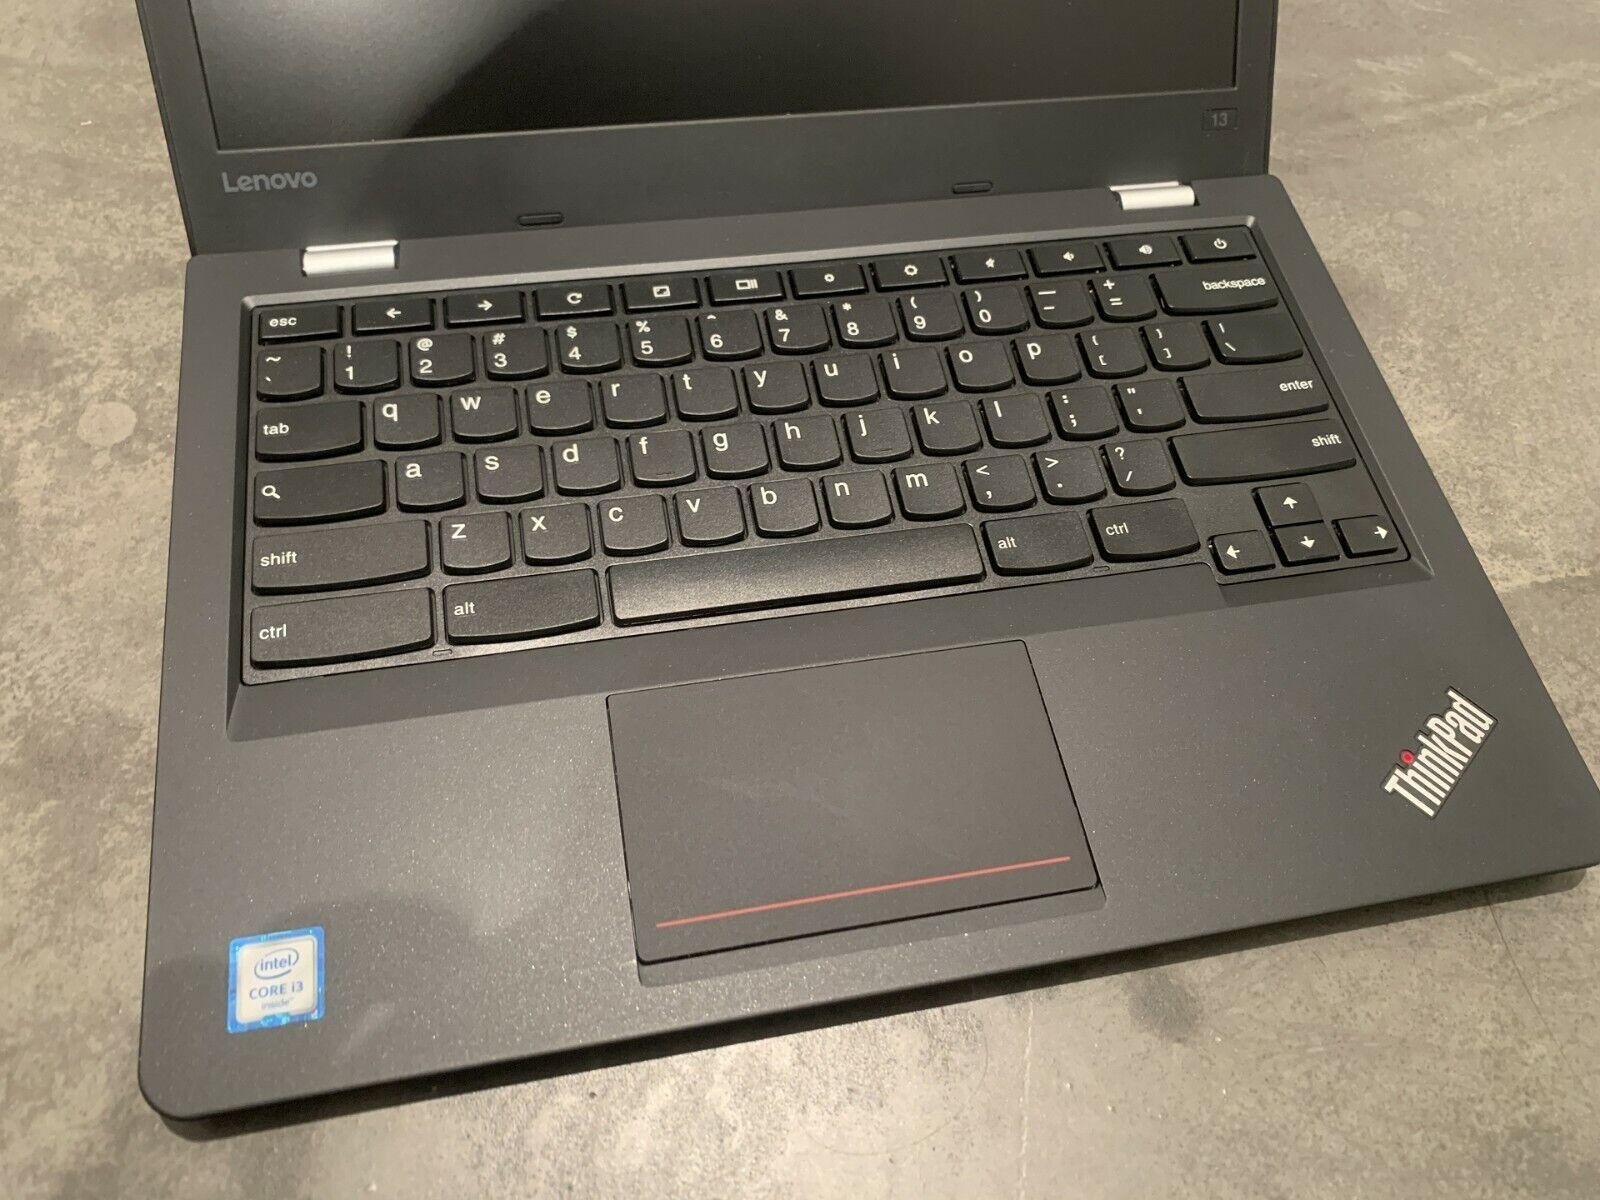 Lenovo thinkpad 13 chromebook - core i3 6100u 4gb ram 16gb mmc 13.3